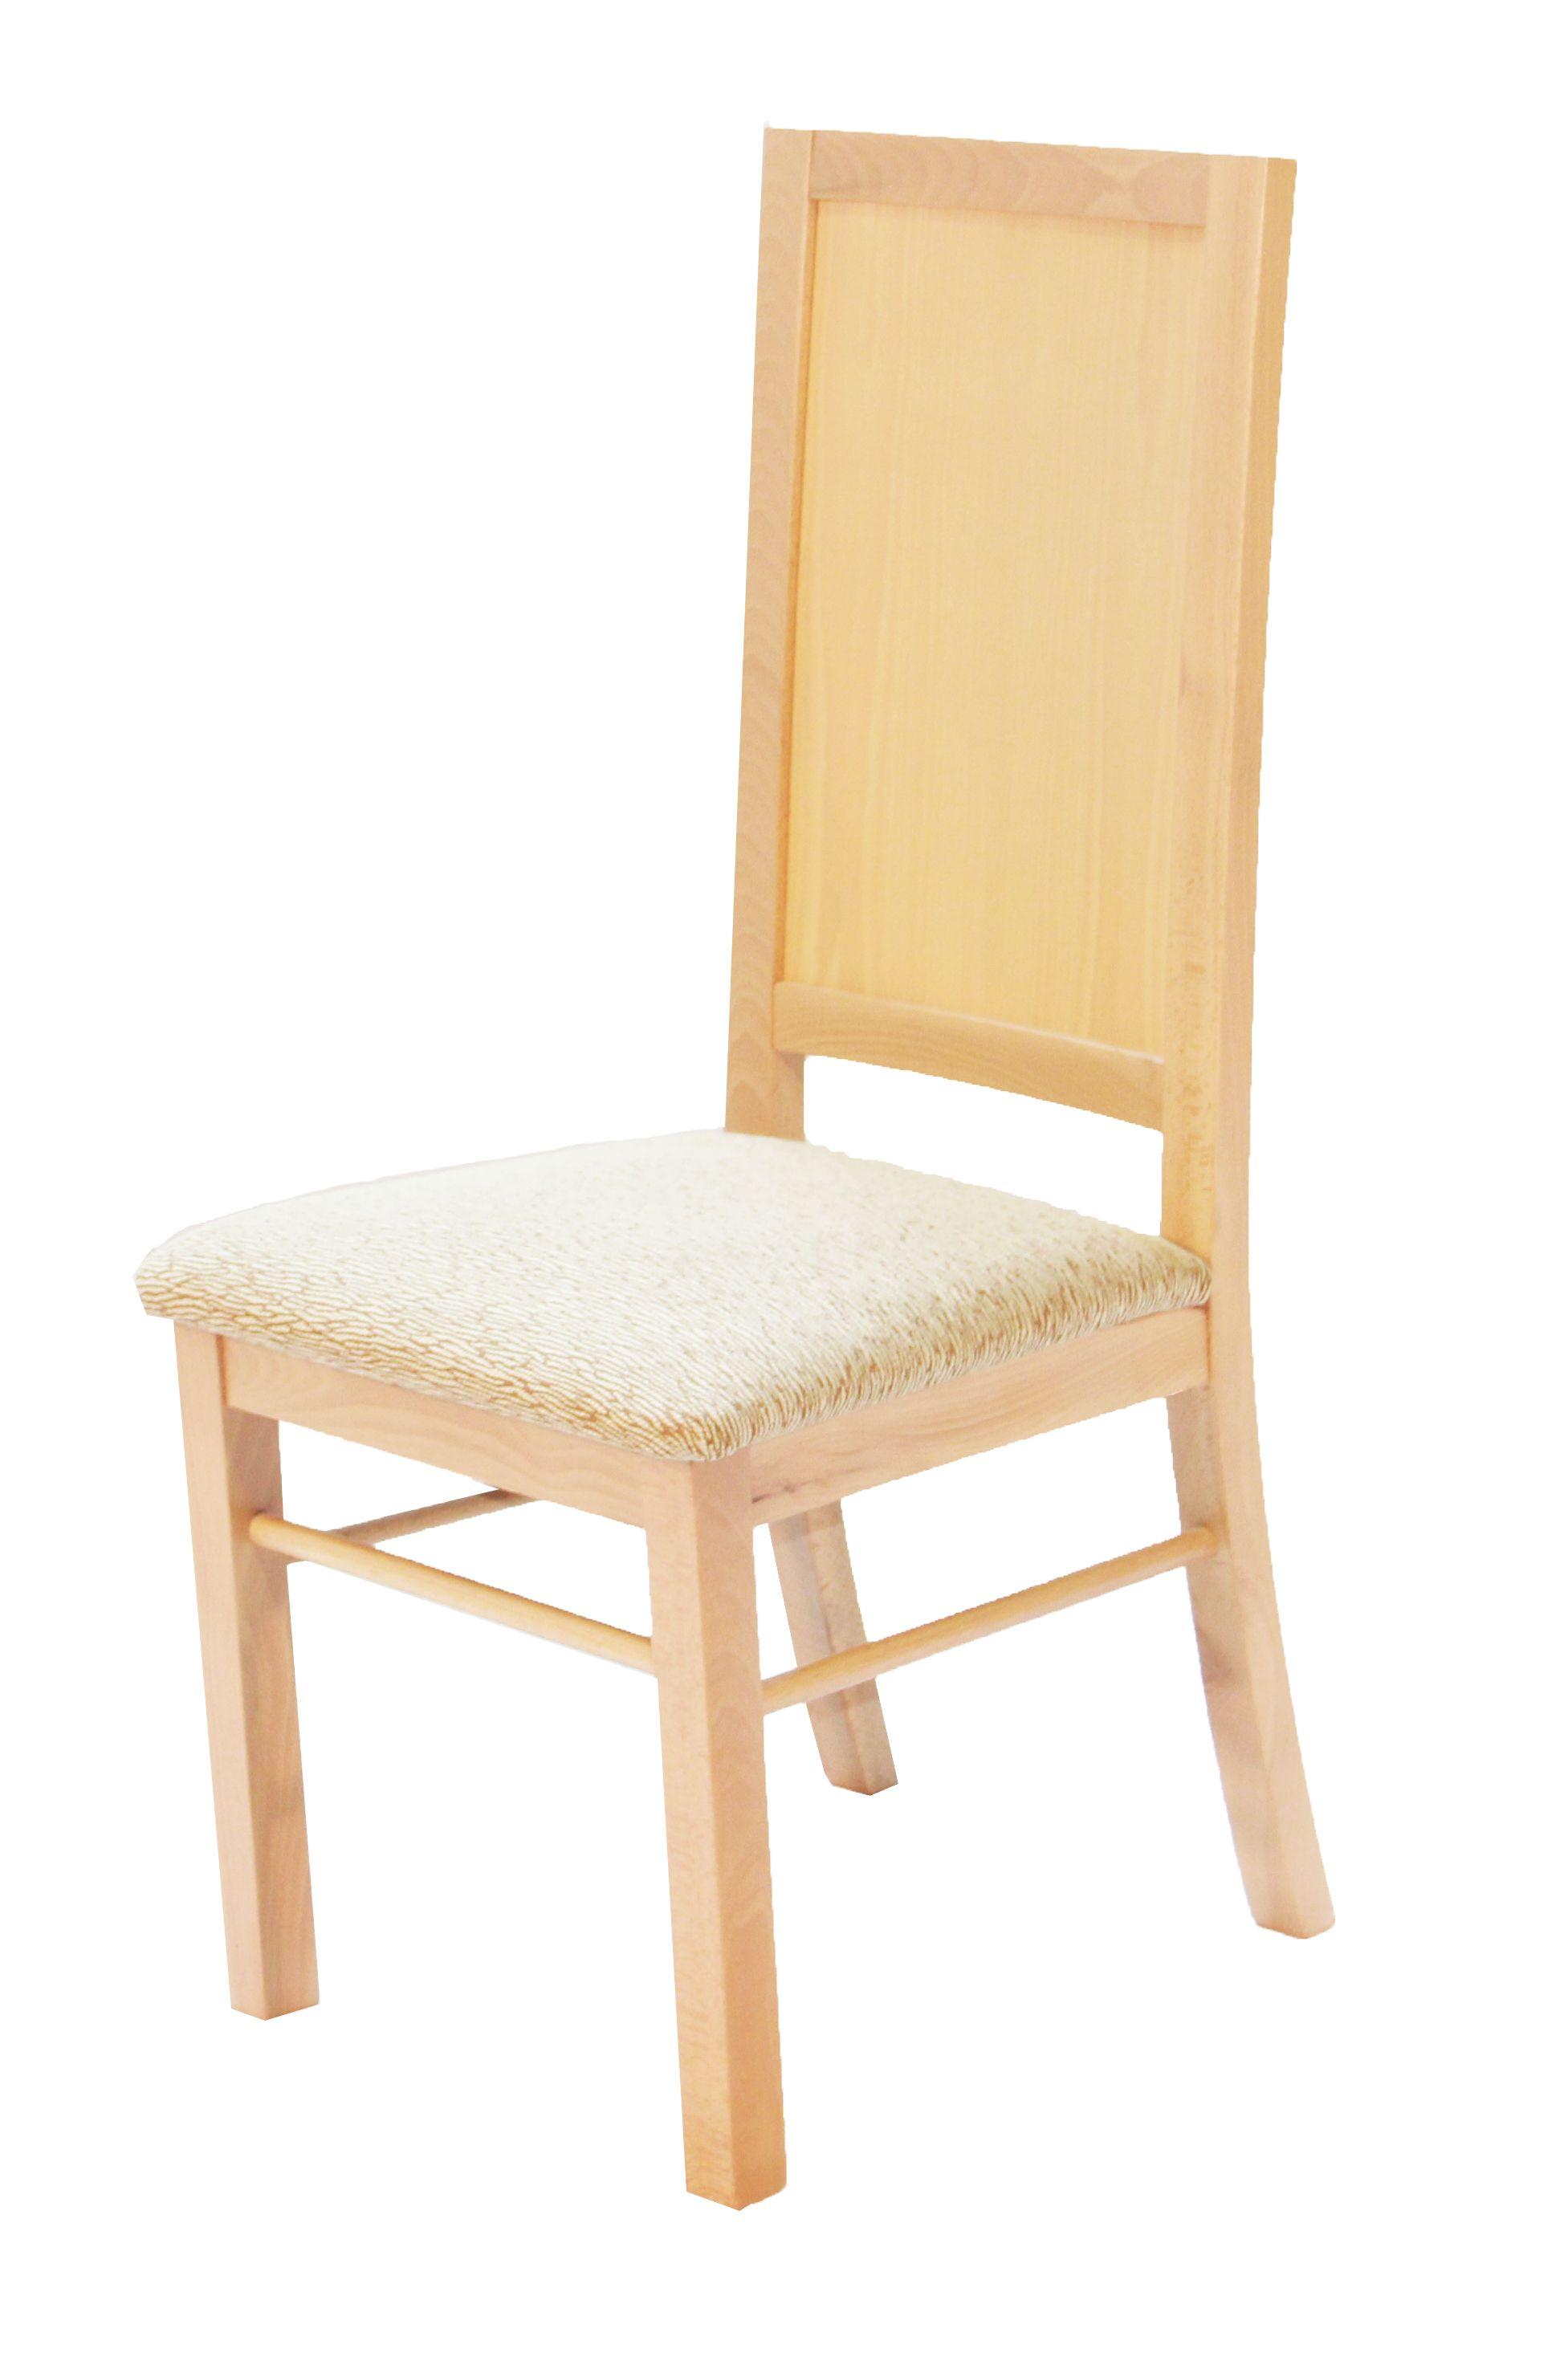 Silla comedor madera silla comedor de madera n plegable for Sillas comedor madera baratas